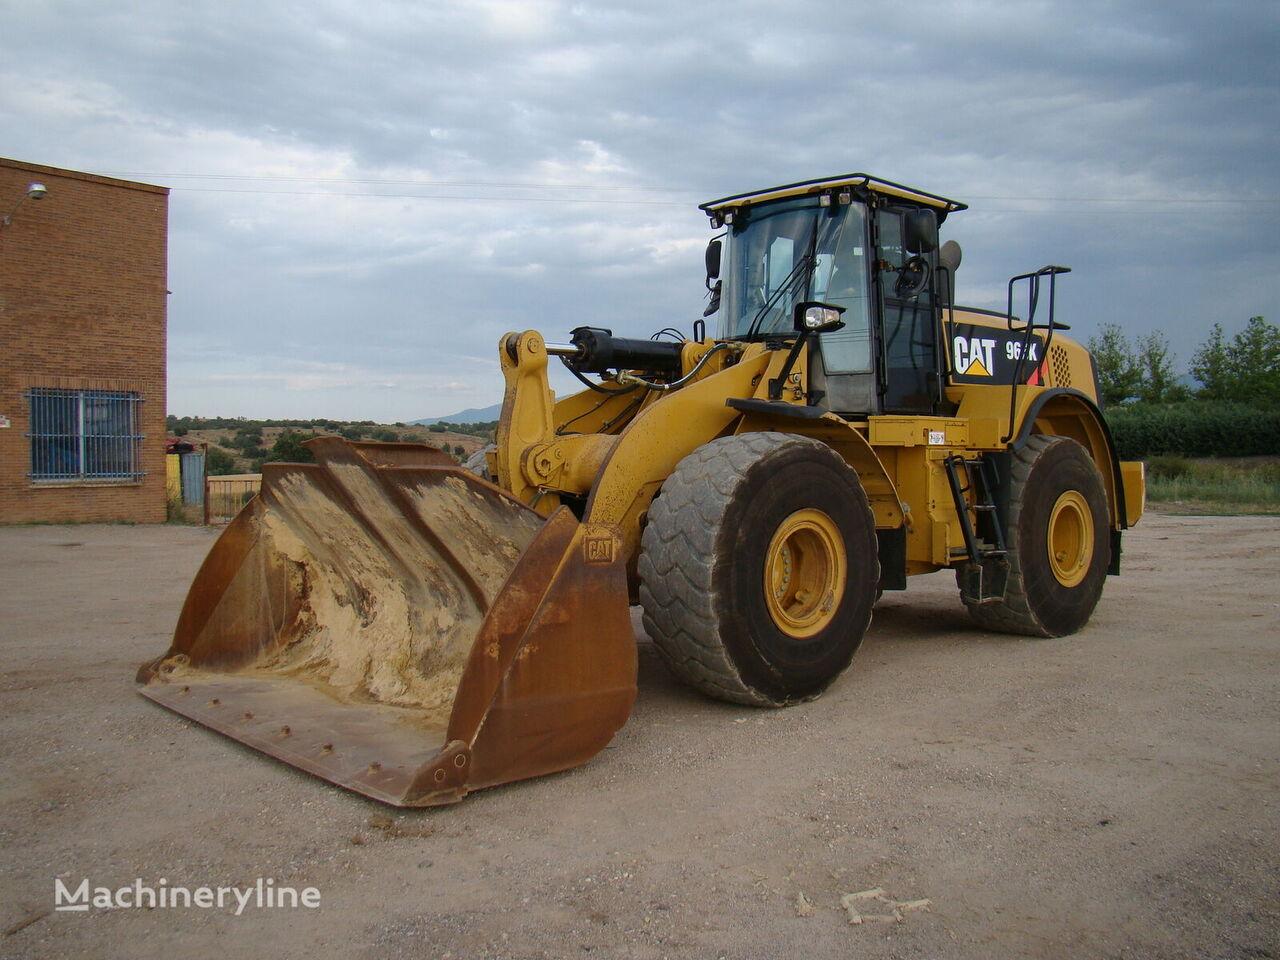 CATERPILLAR 966 K wheel loader